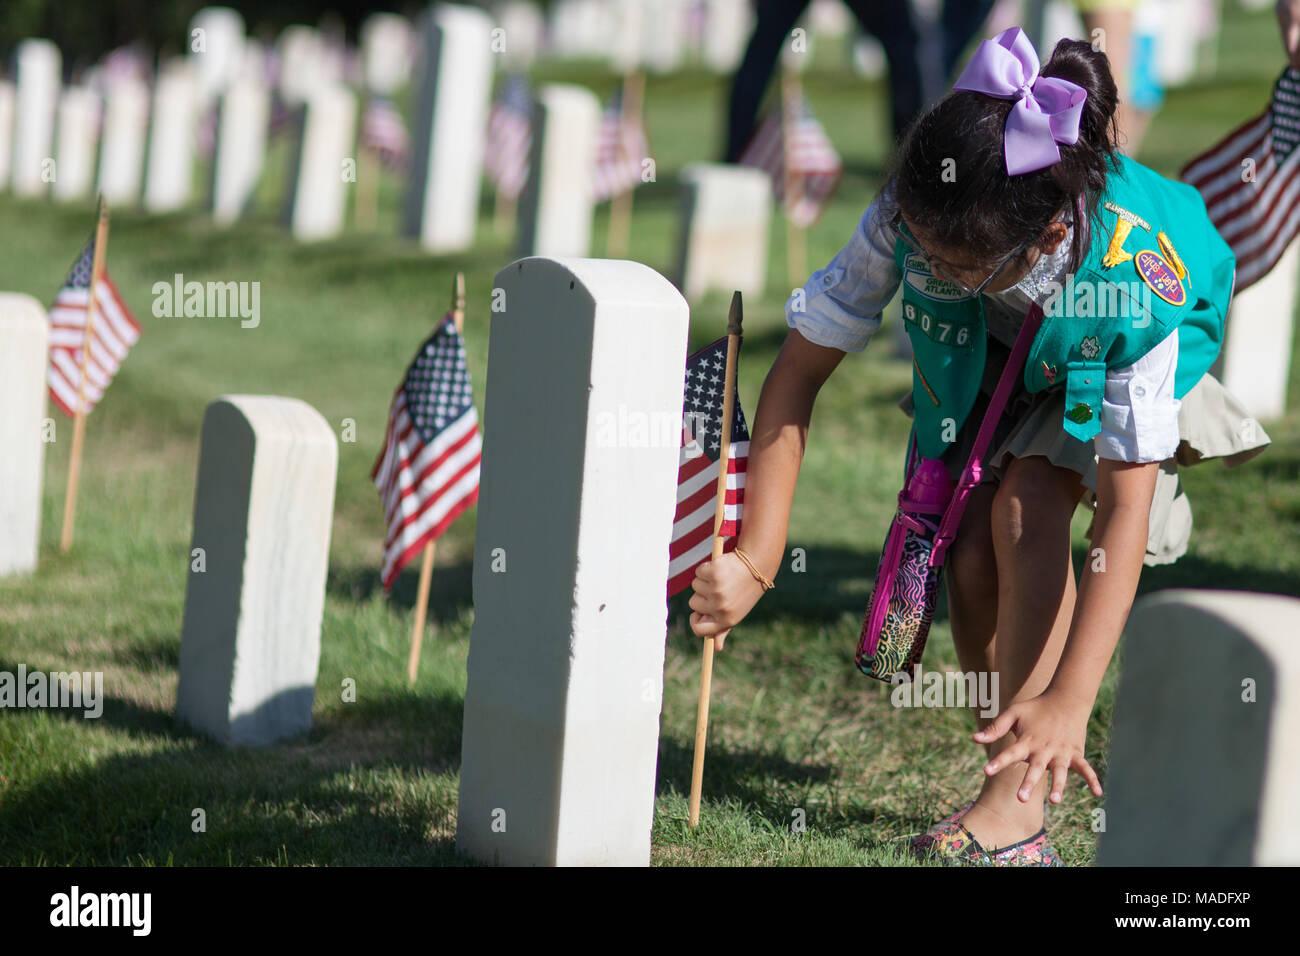 Girl Scout planting flag at civil war memorial cemetery Memorial Day weekend. - Stock Image